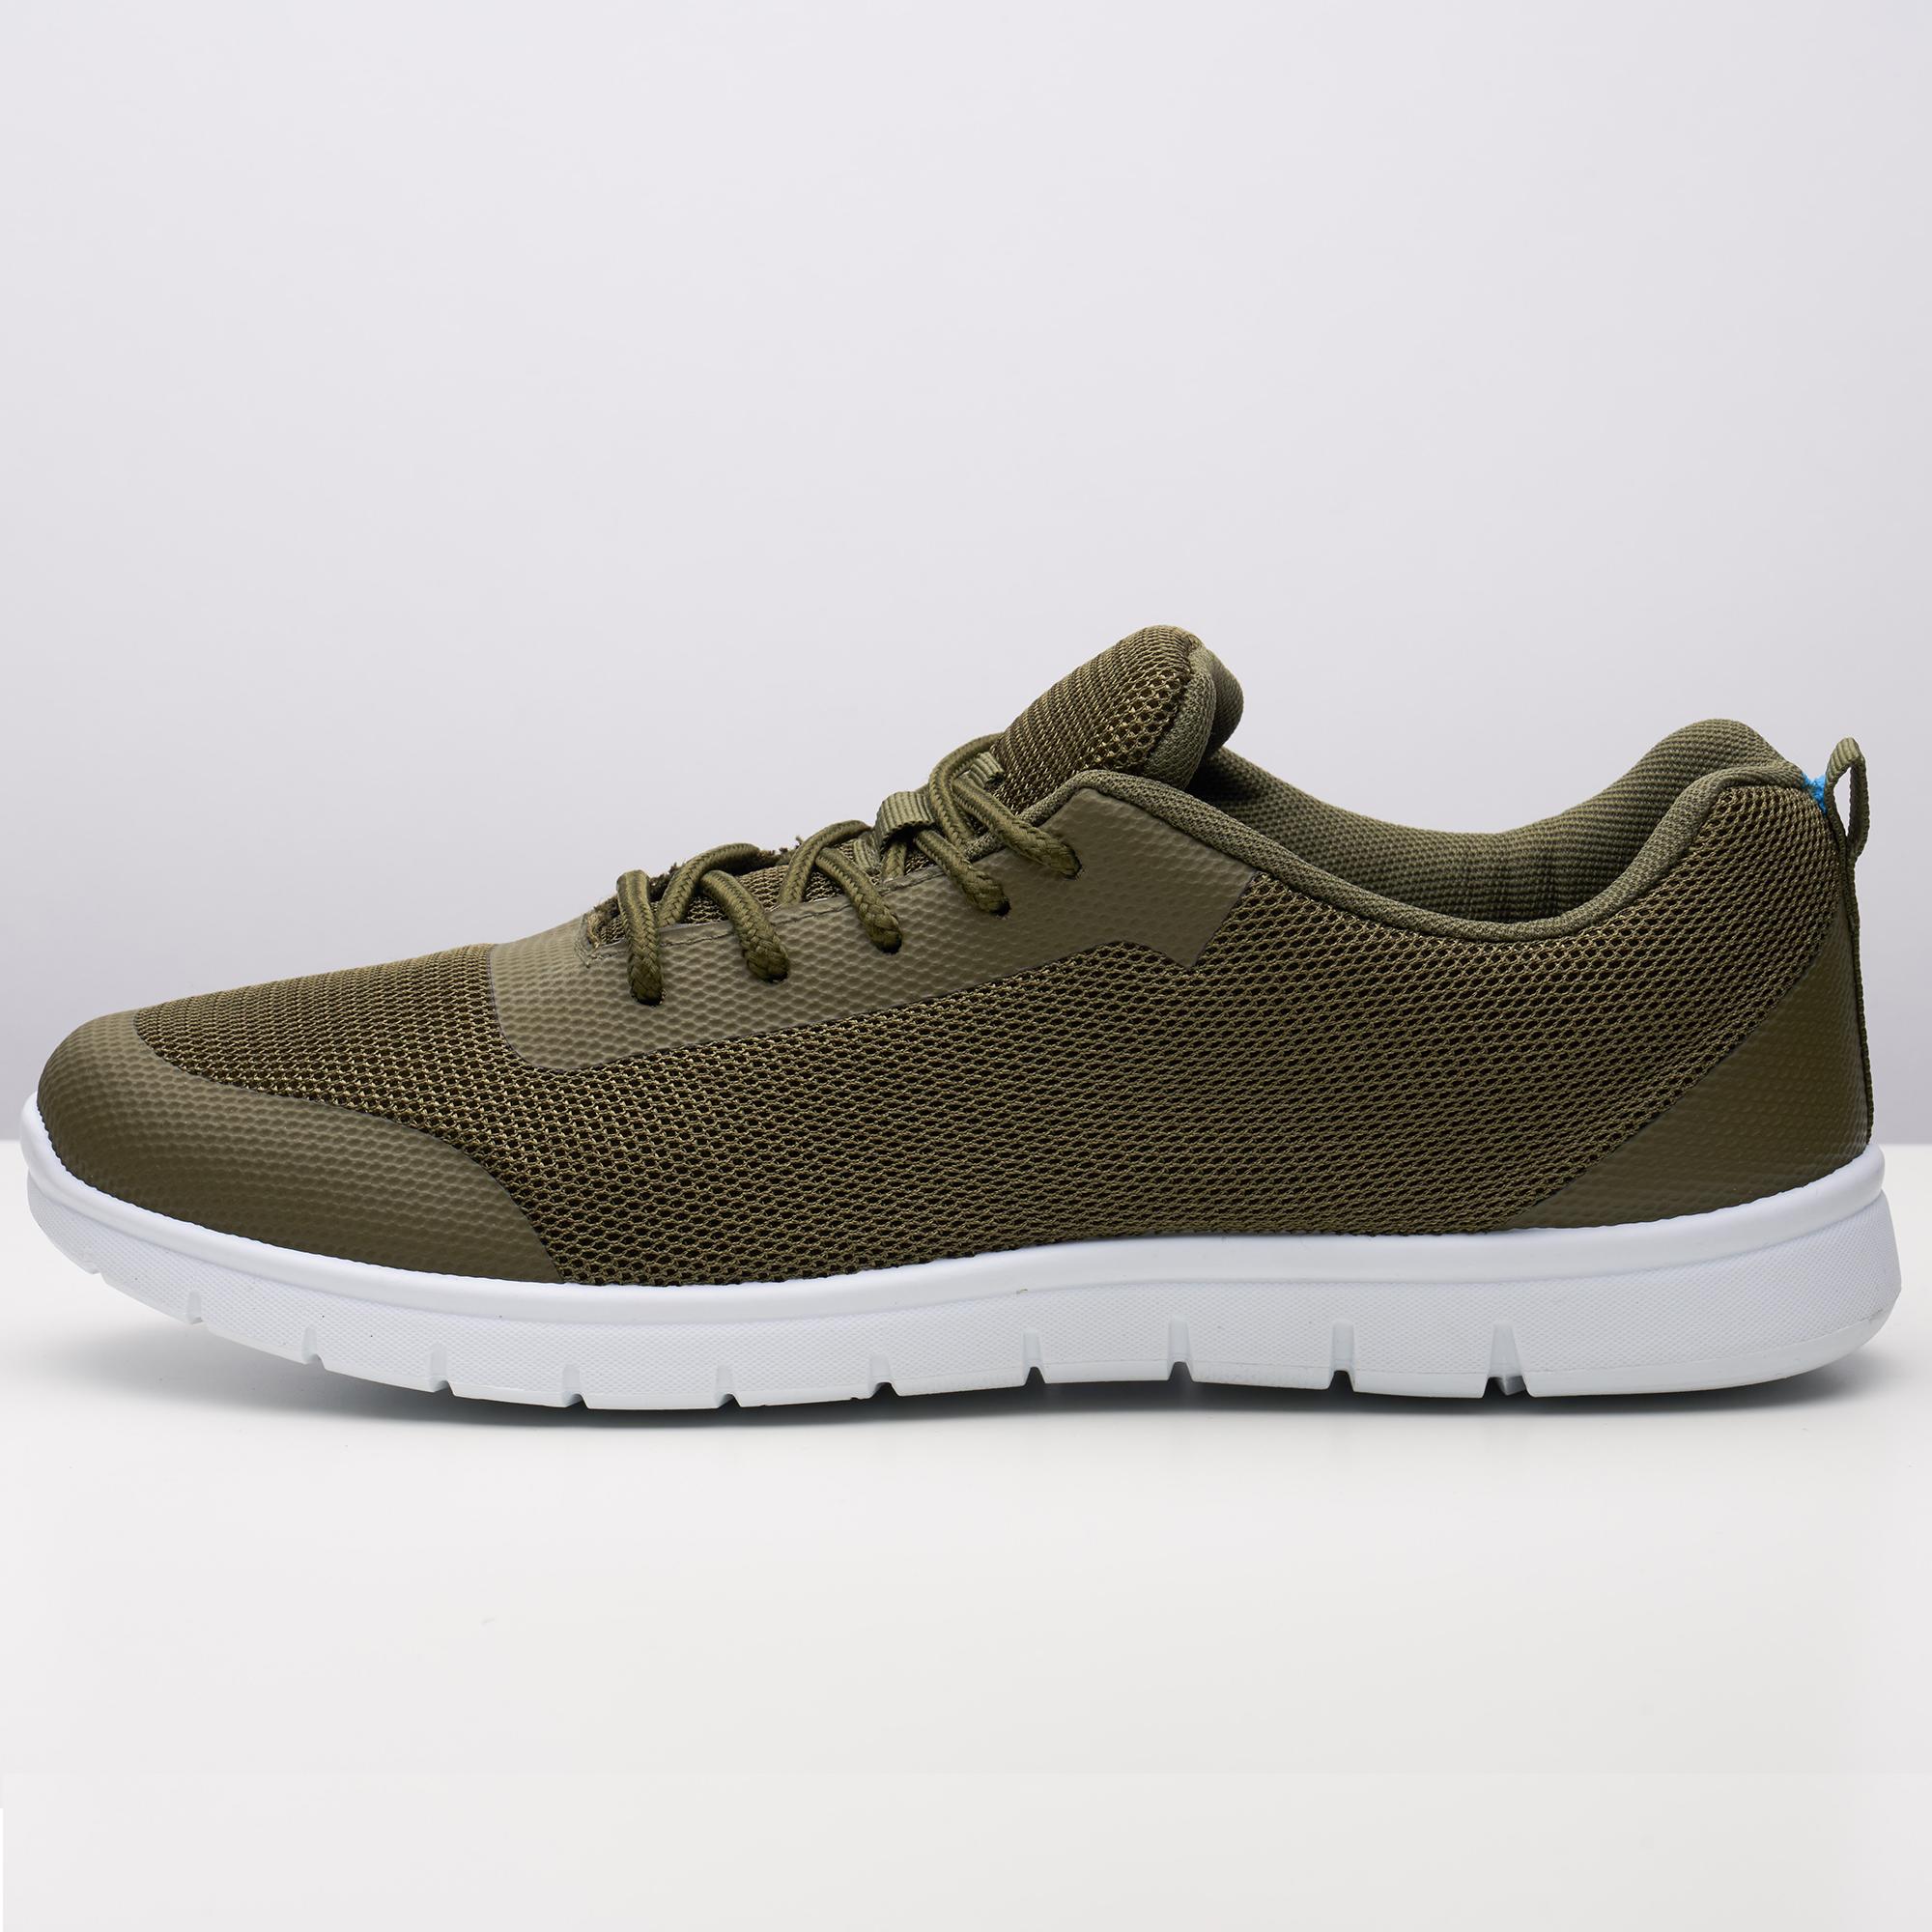 thumbnail 34 - Alpine Swiss Bolt Mesh Sneaker Casual Light Shoes For Men With Shoe Bag